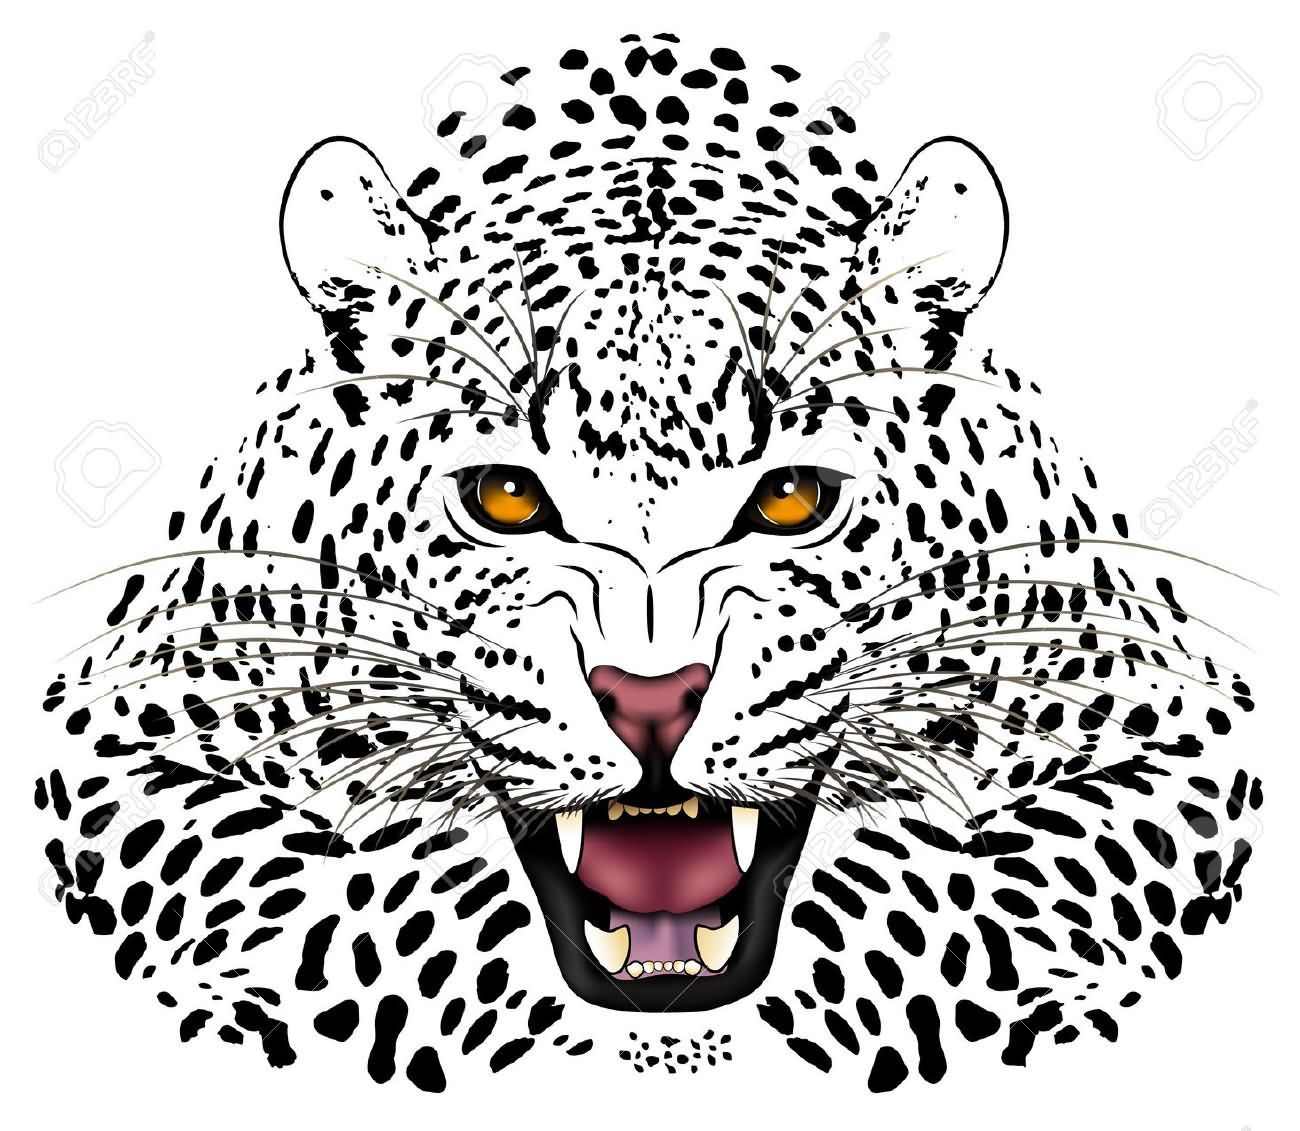 5 unique leopard tattoo designs and ideas. Black Bedroom Furniture Sets. Home Design Ideas